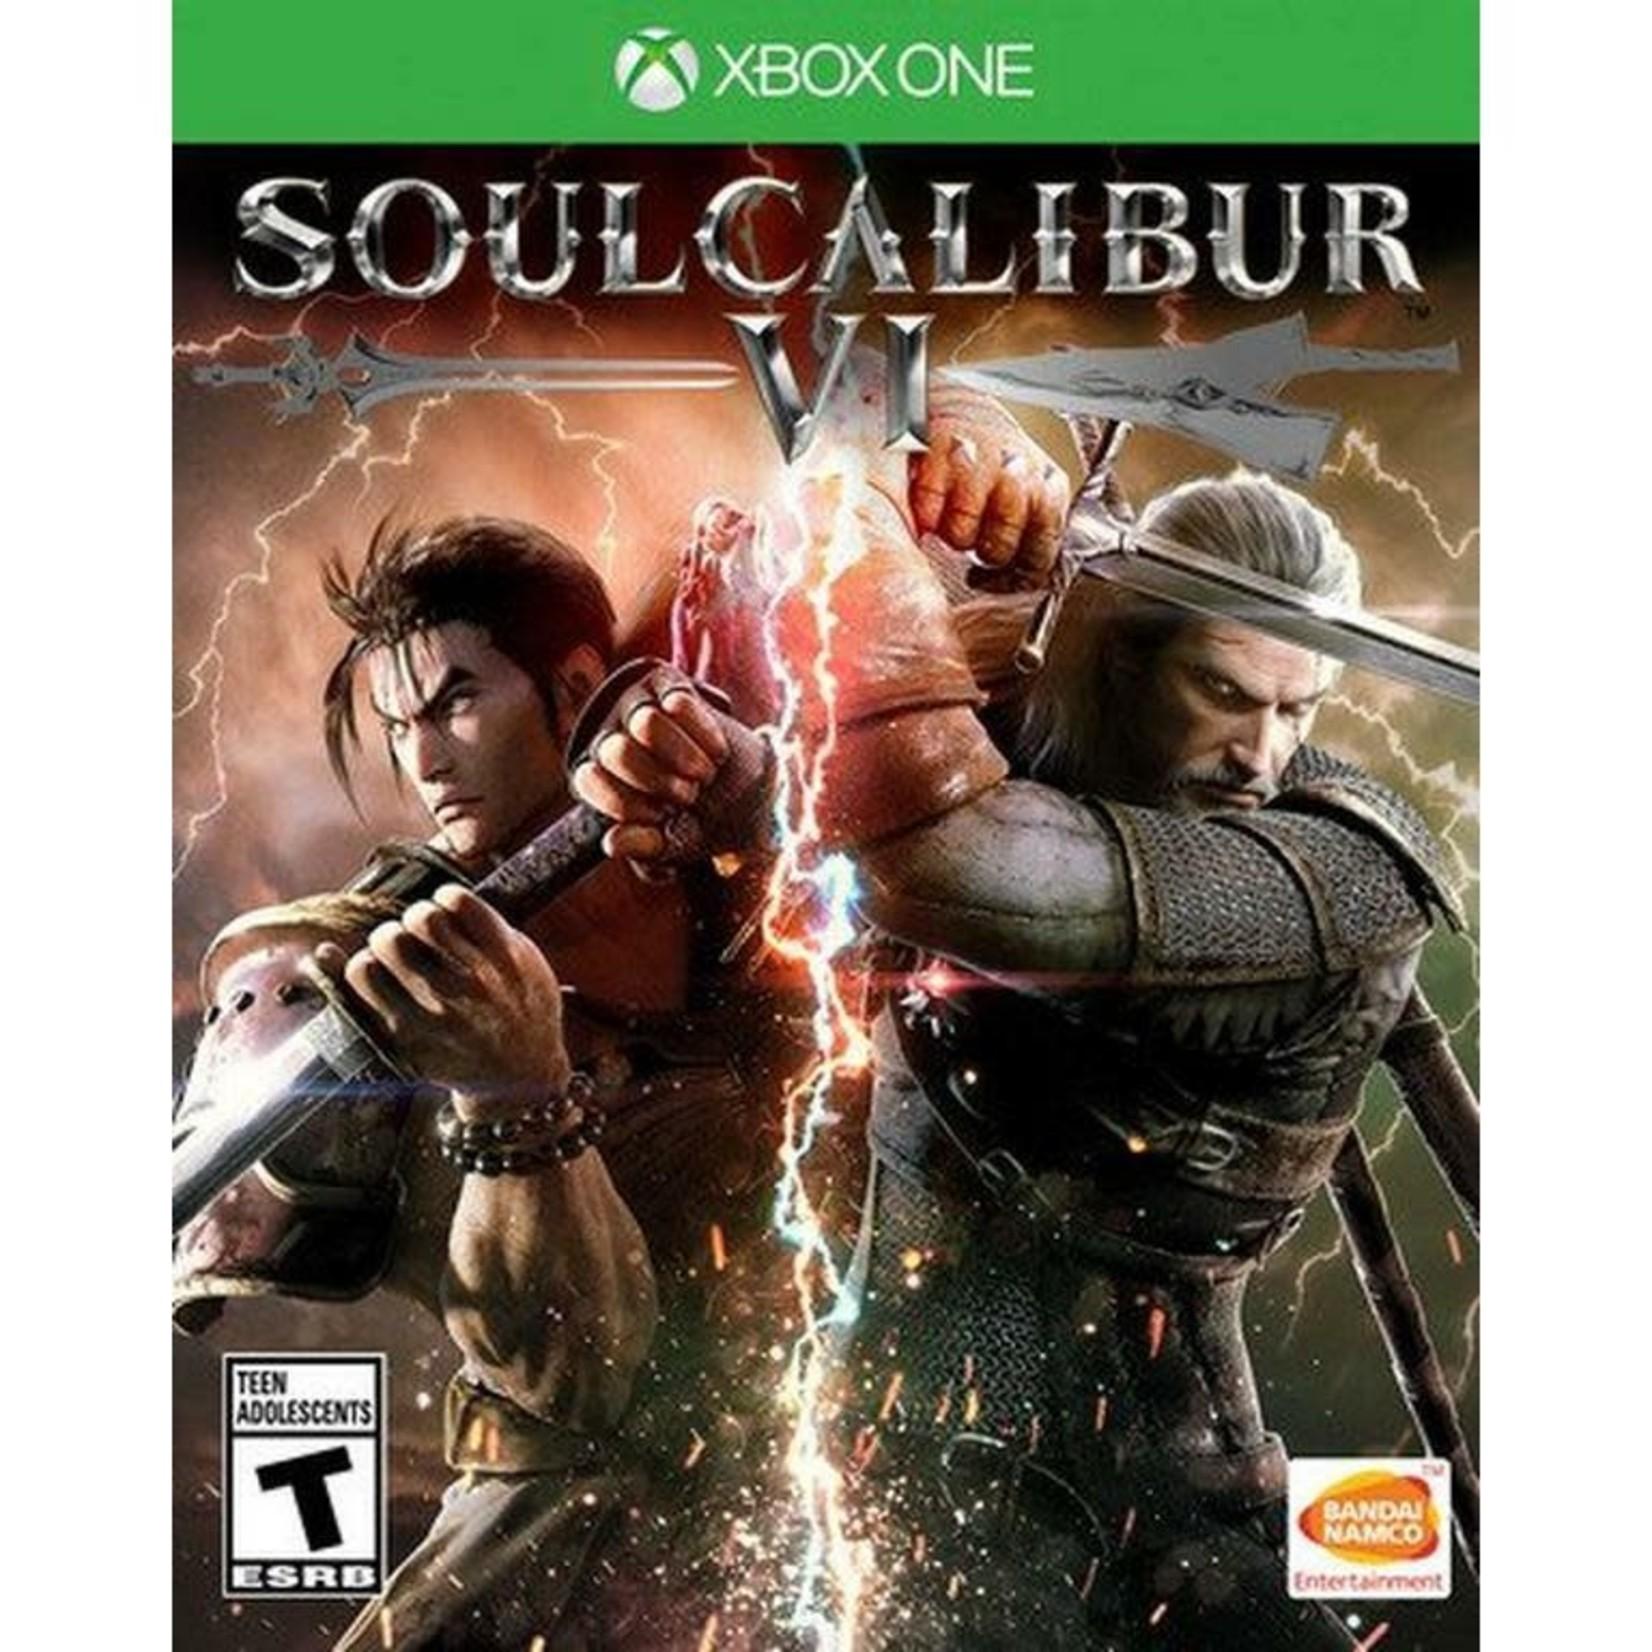 XB1-Soulcalibur VI